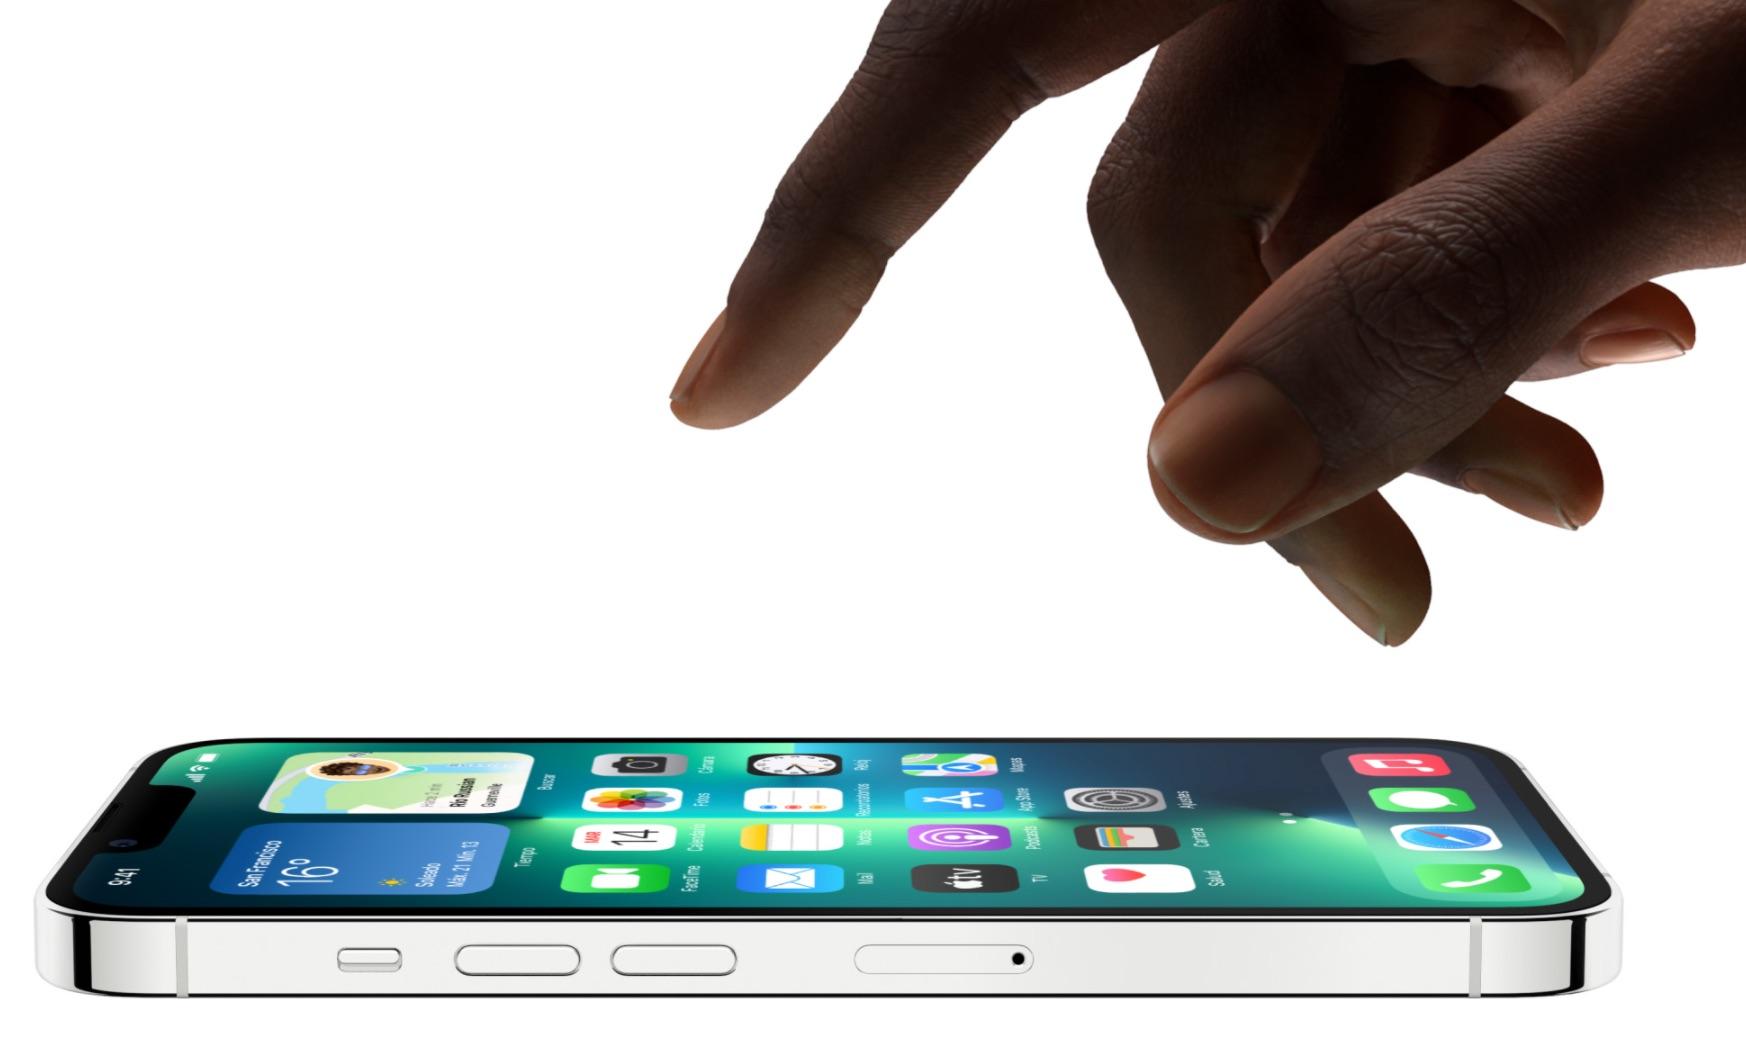 ProMotion a 120 Hz en la pantalla del iPhone 13 Pro